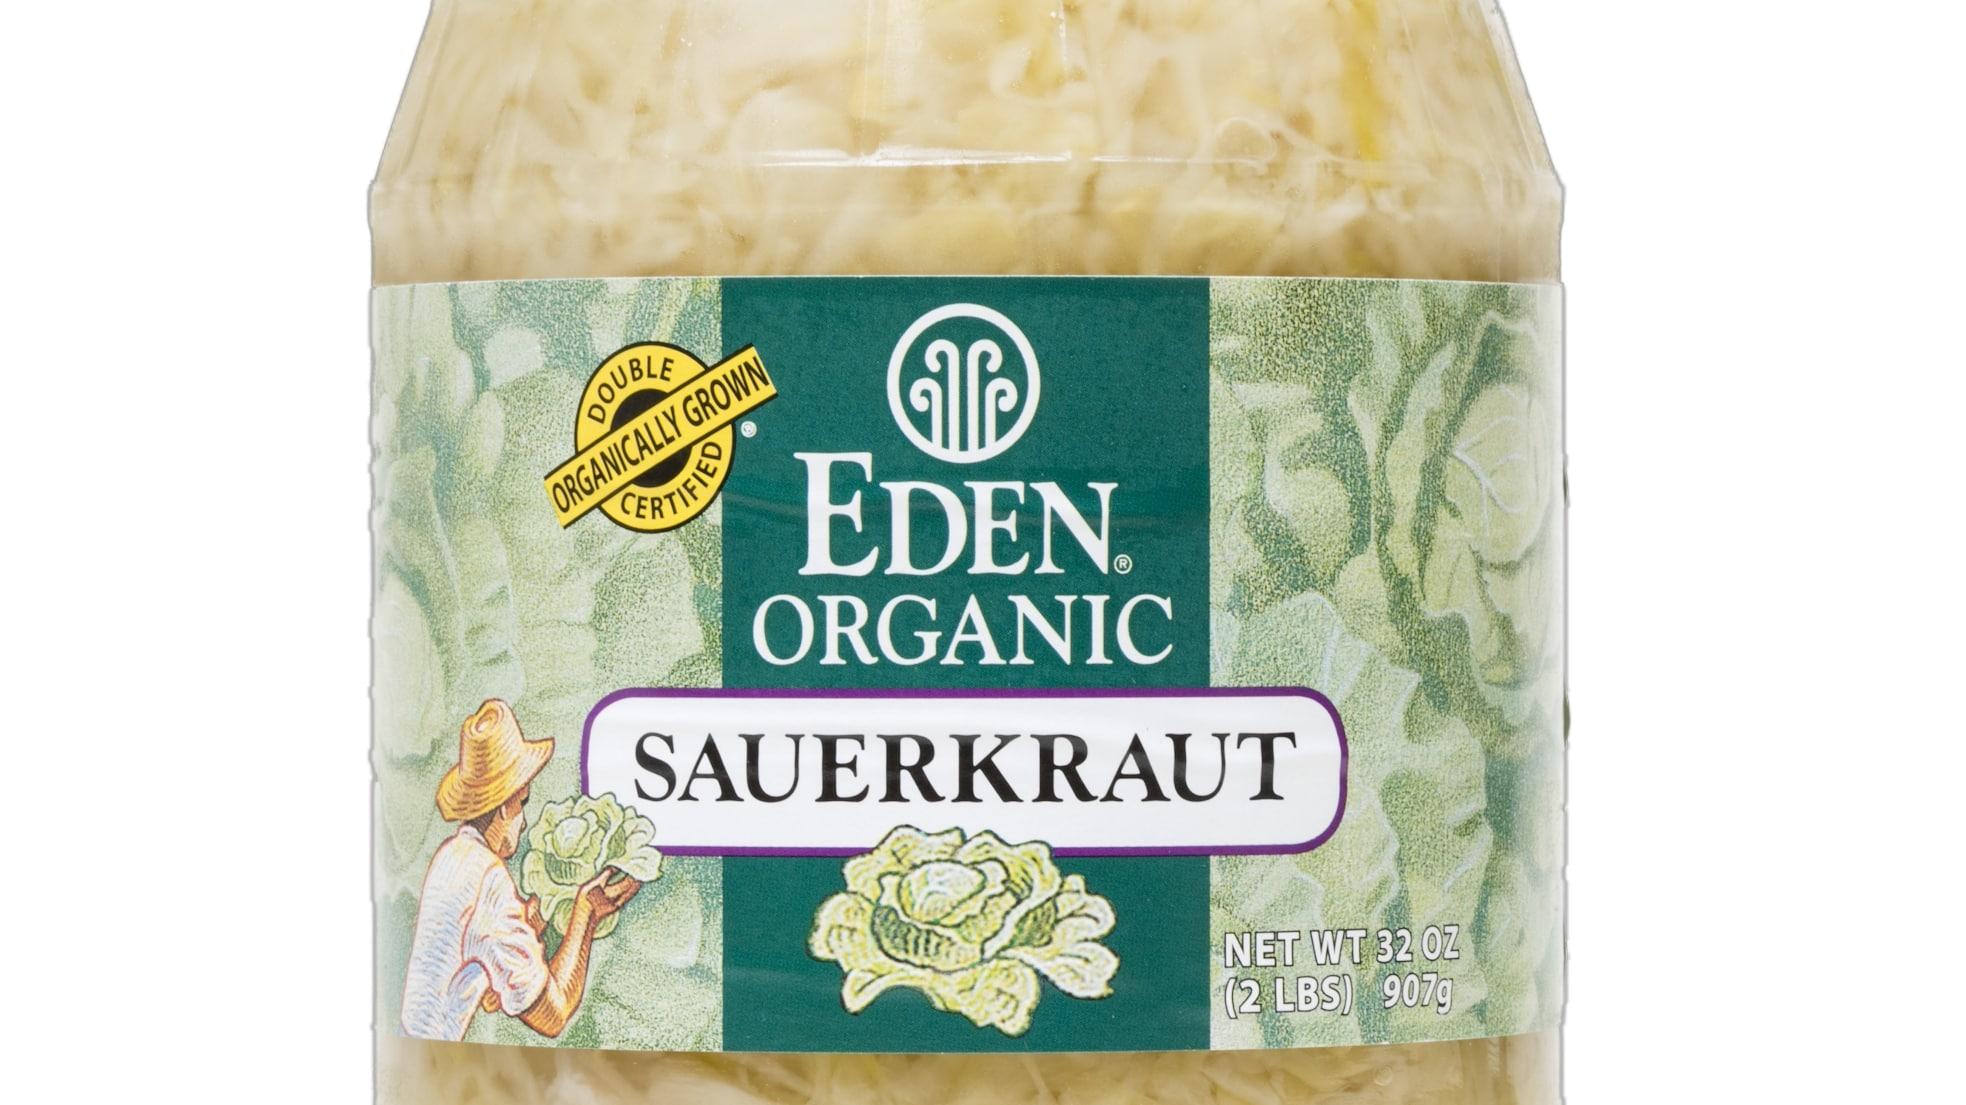 27452 sil sauerkraut eden organic sauerkraut